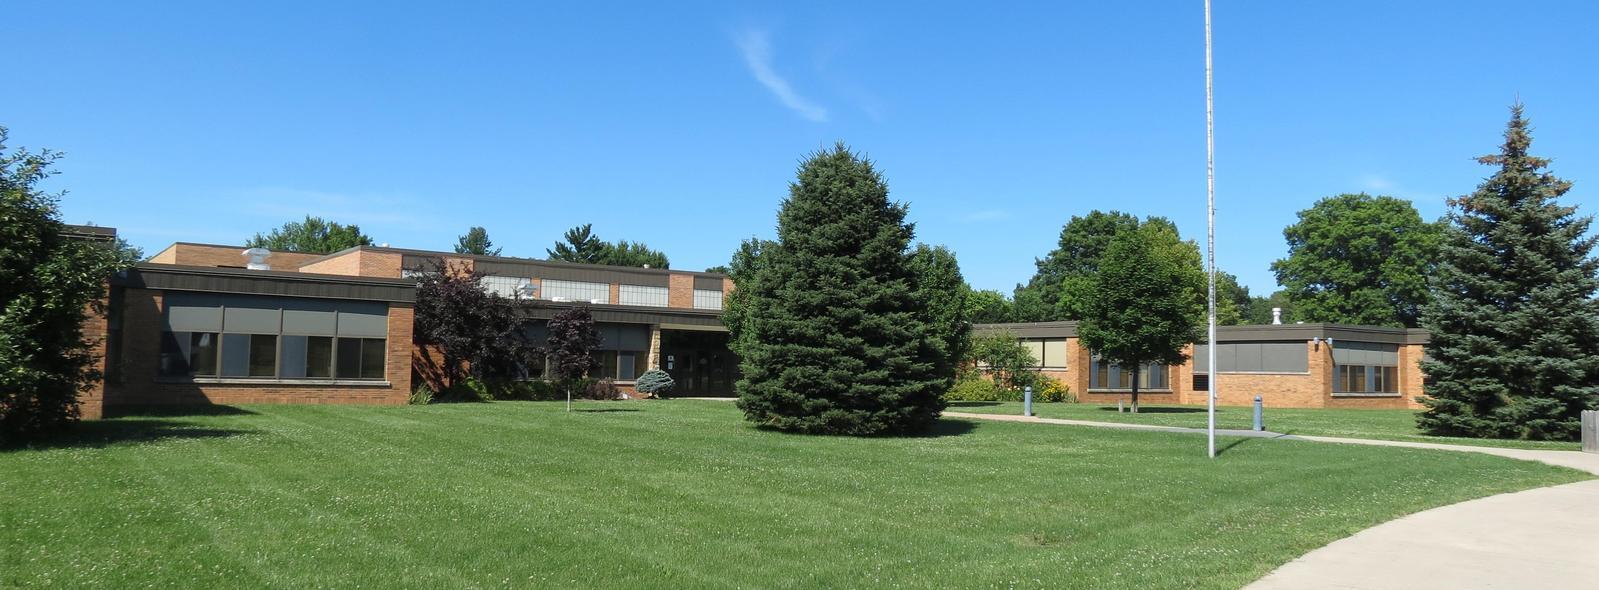 Dix Street Elementary building